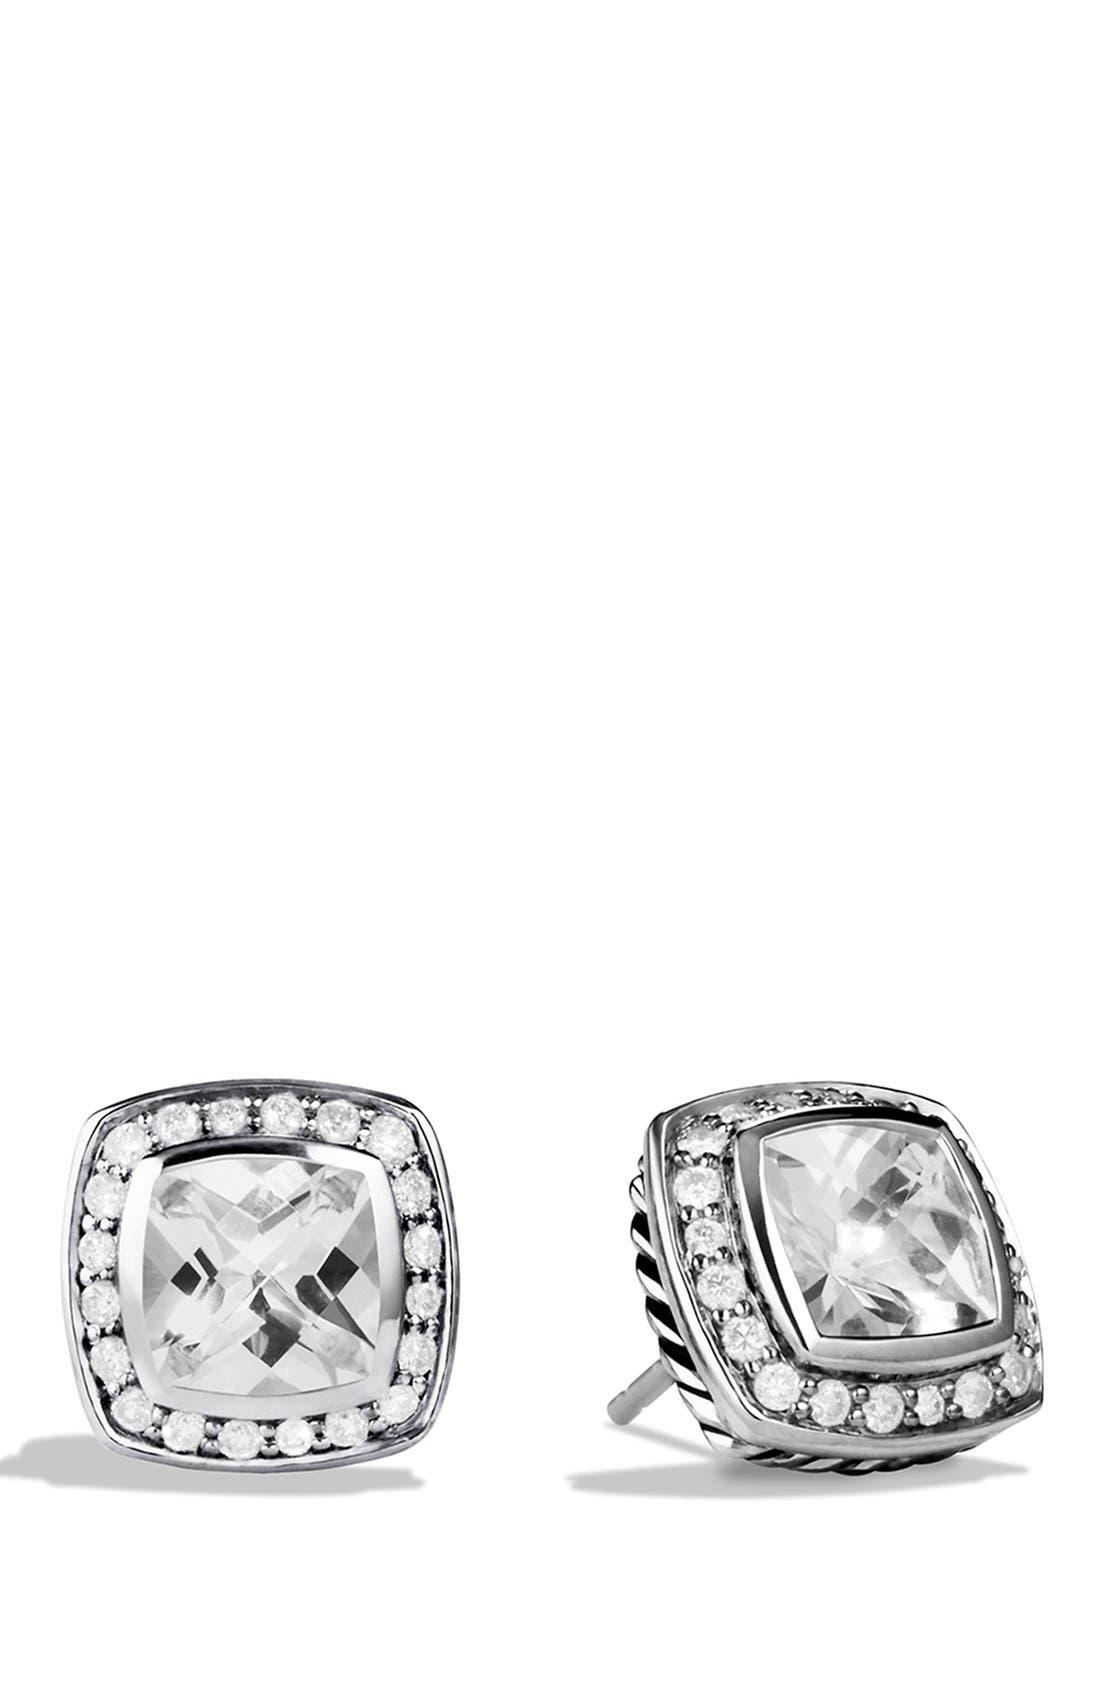 DAVID YURMAN 'Albion' Petite Earrings with Semiprecious Stones & Diamonds, Main, color, WHITE TOPAZ